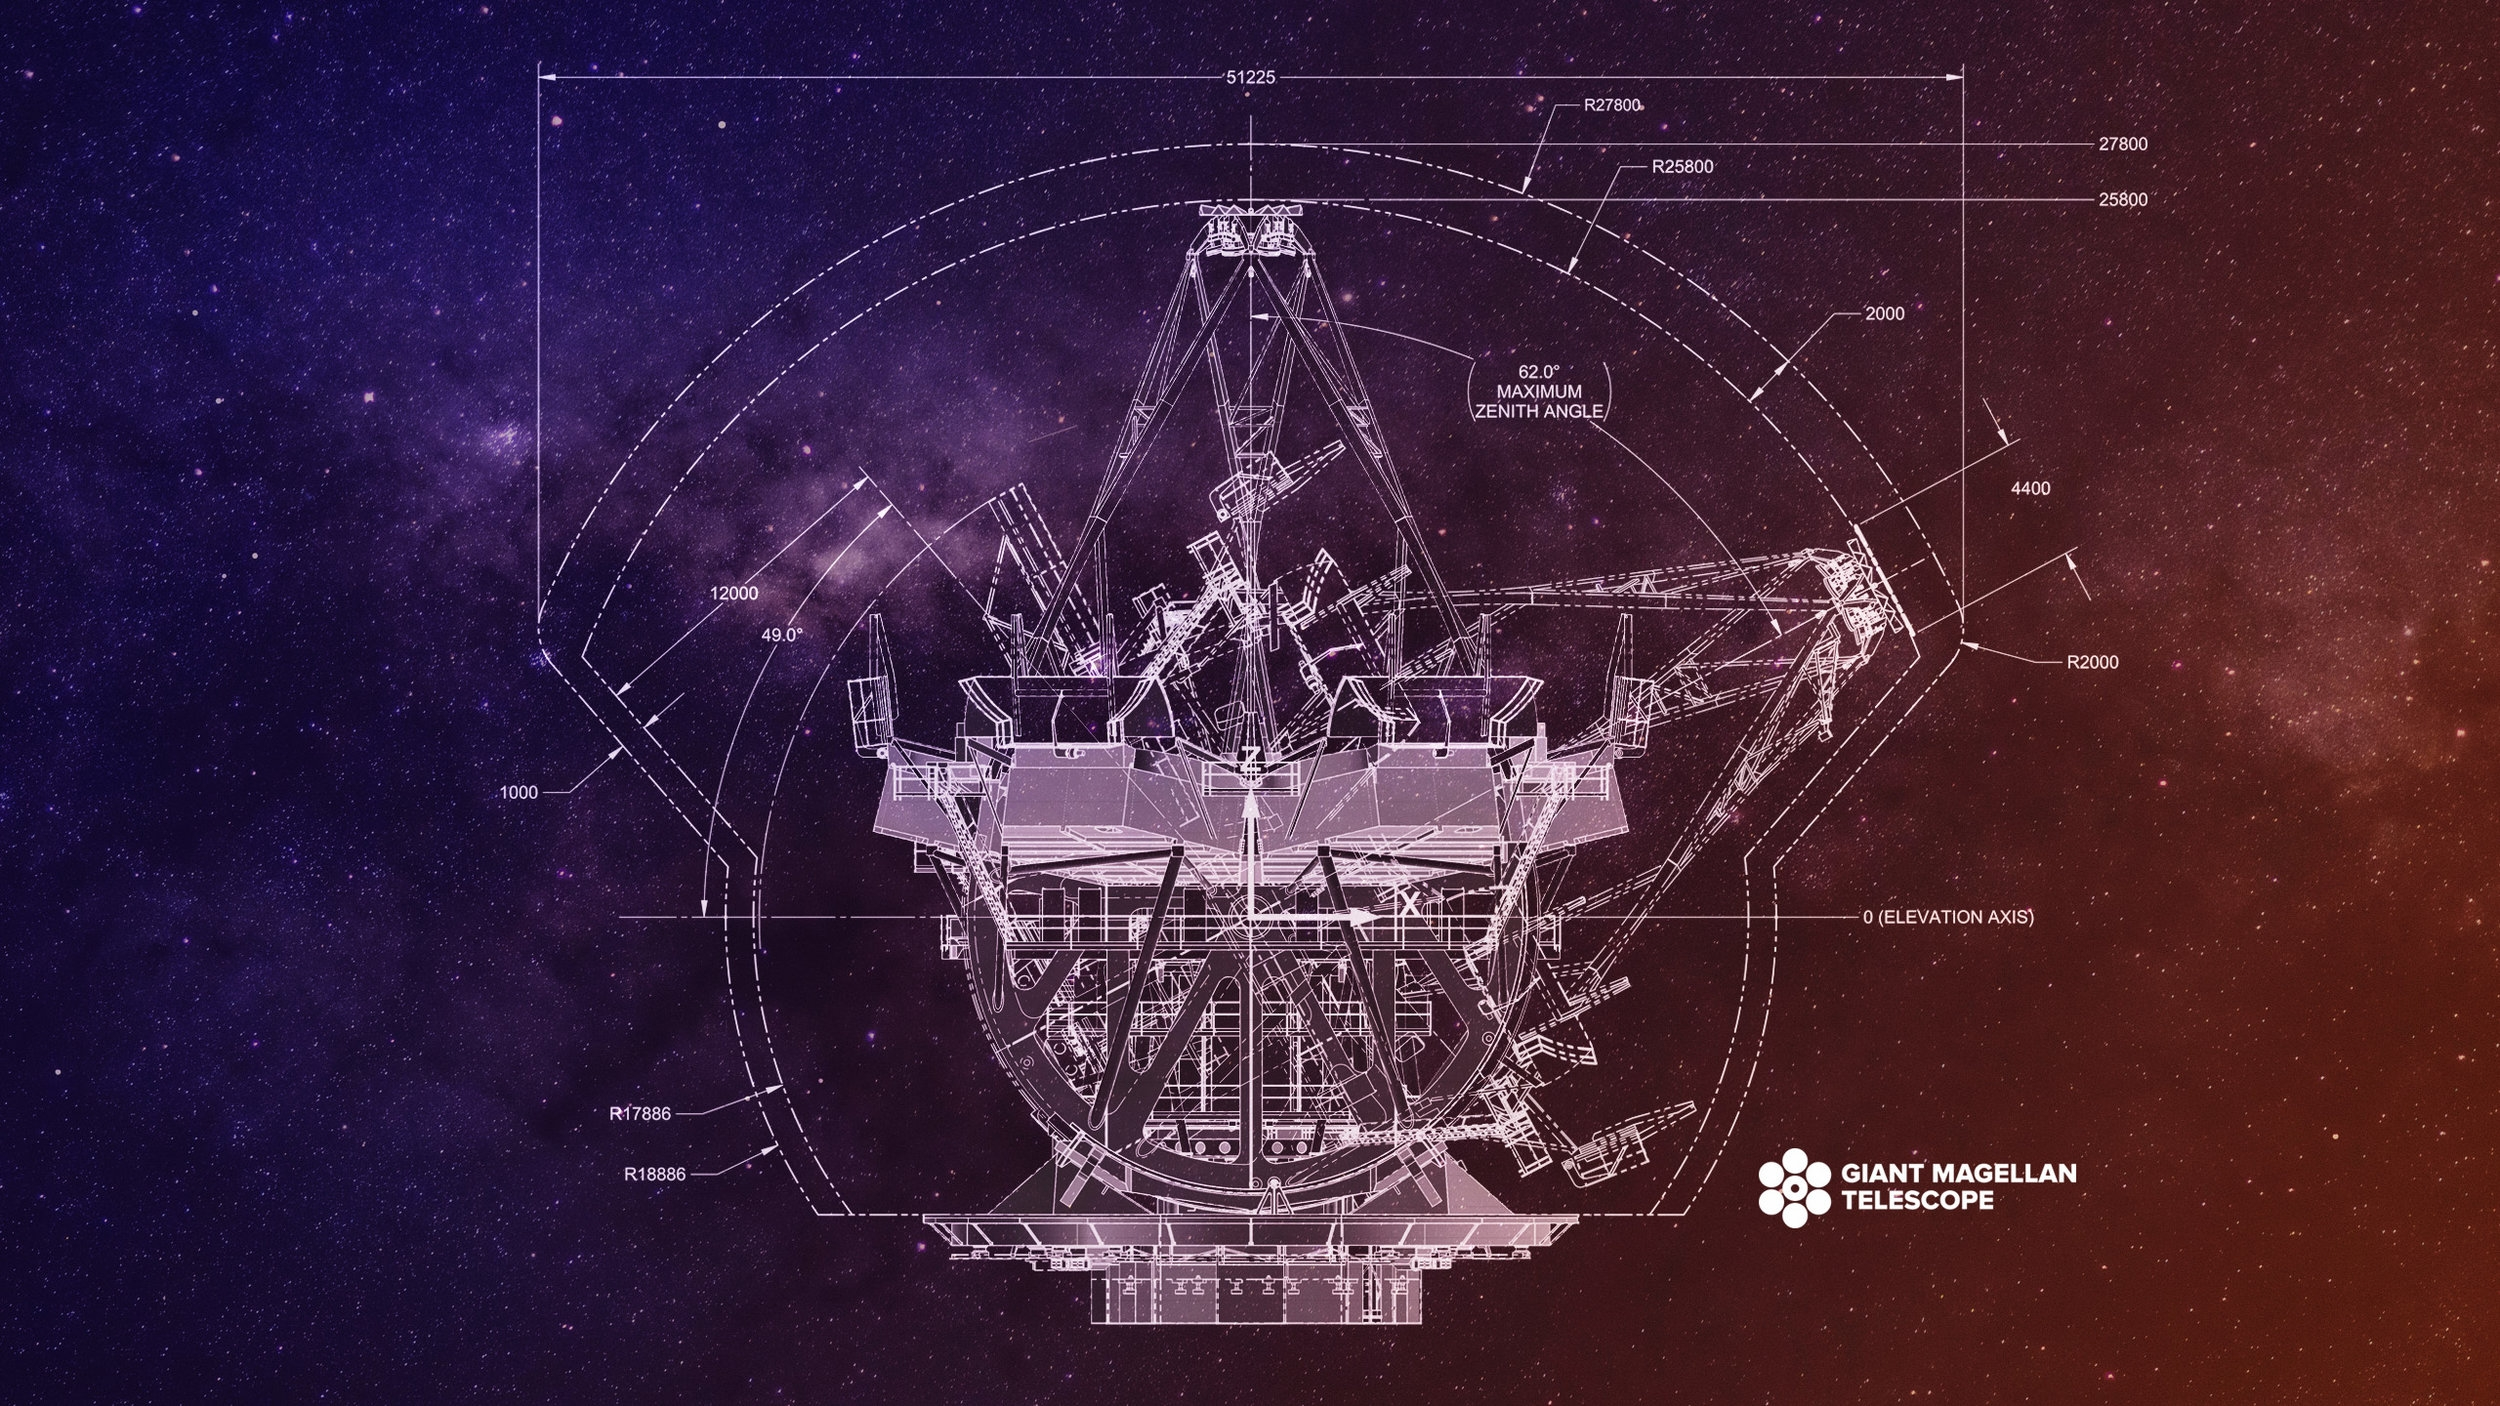 Giant Magellan Telescope  Gallery   Instagram   YouTube